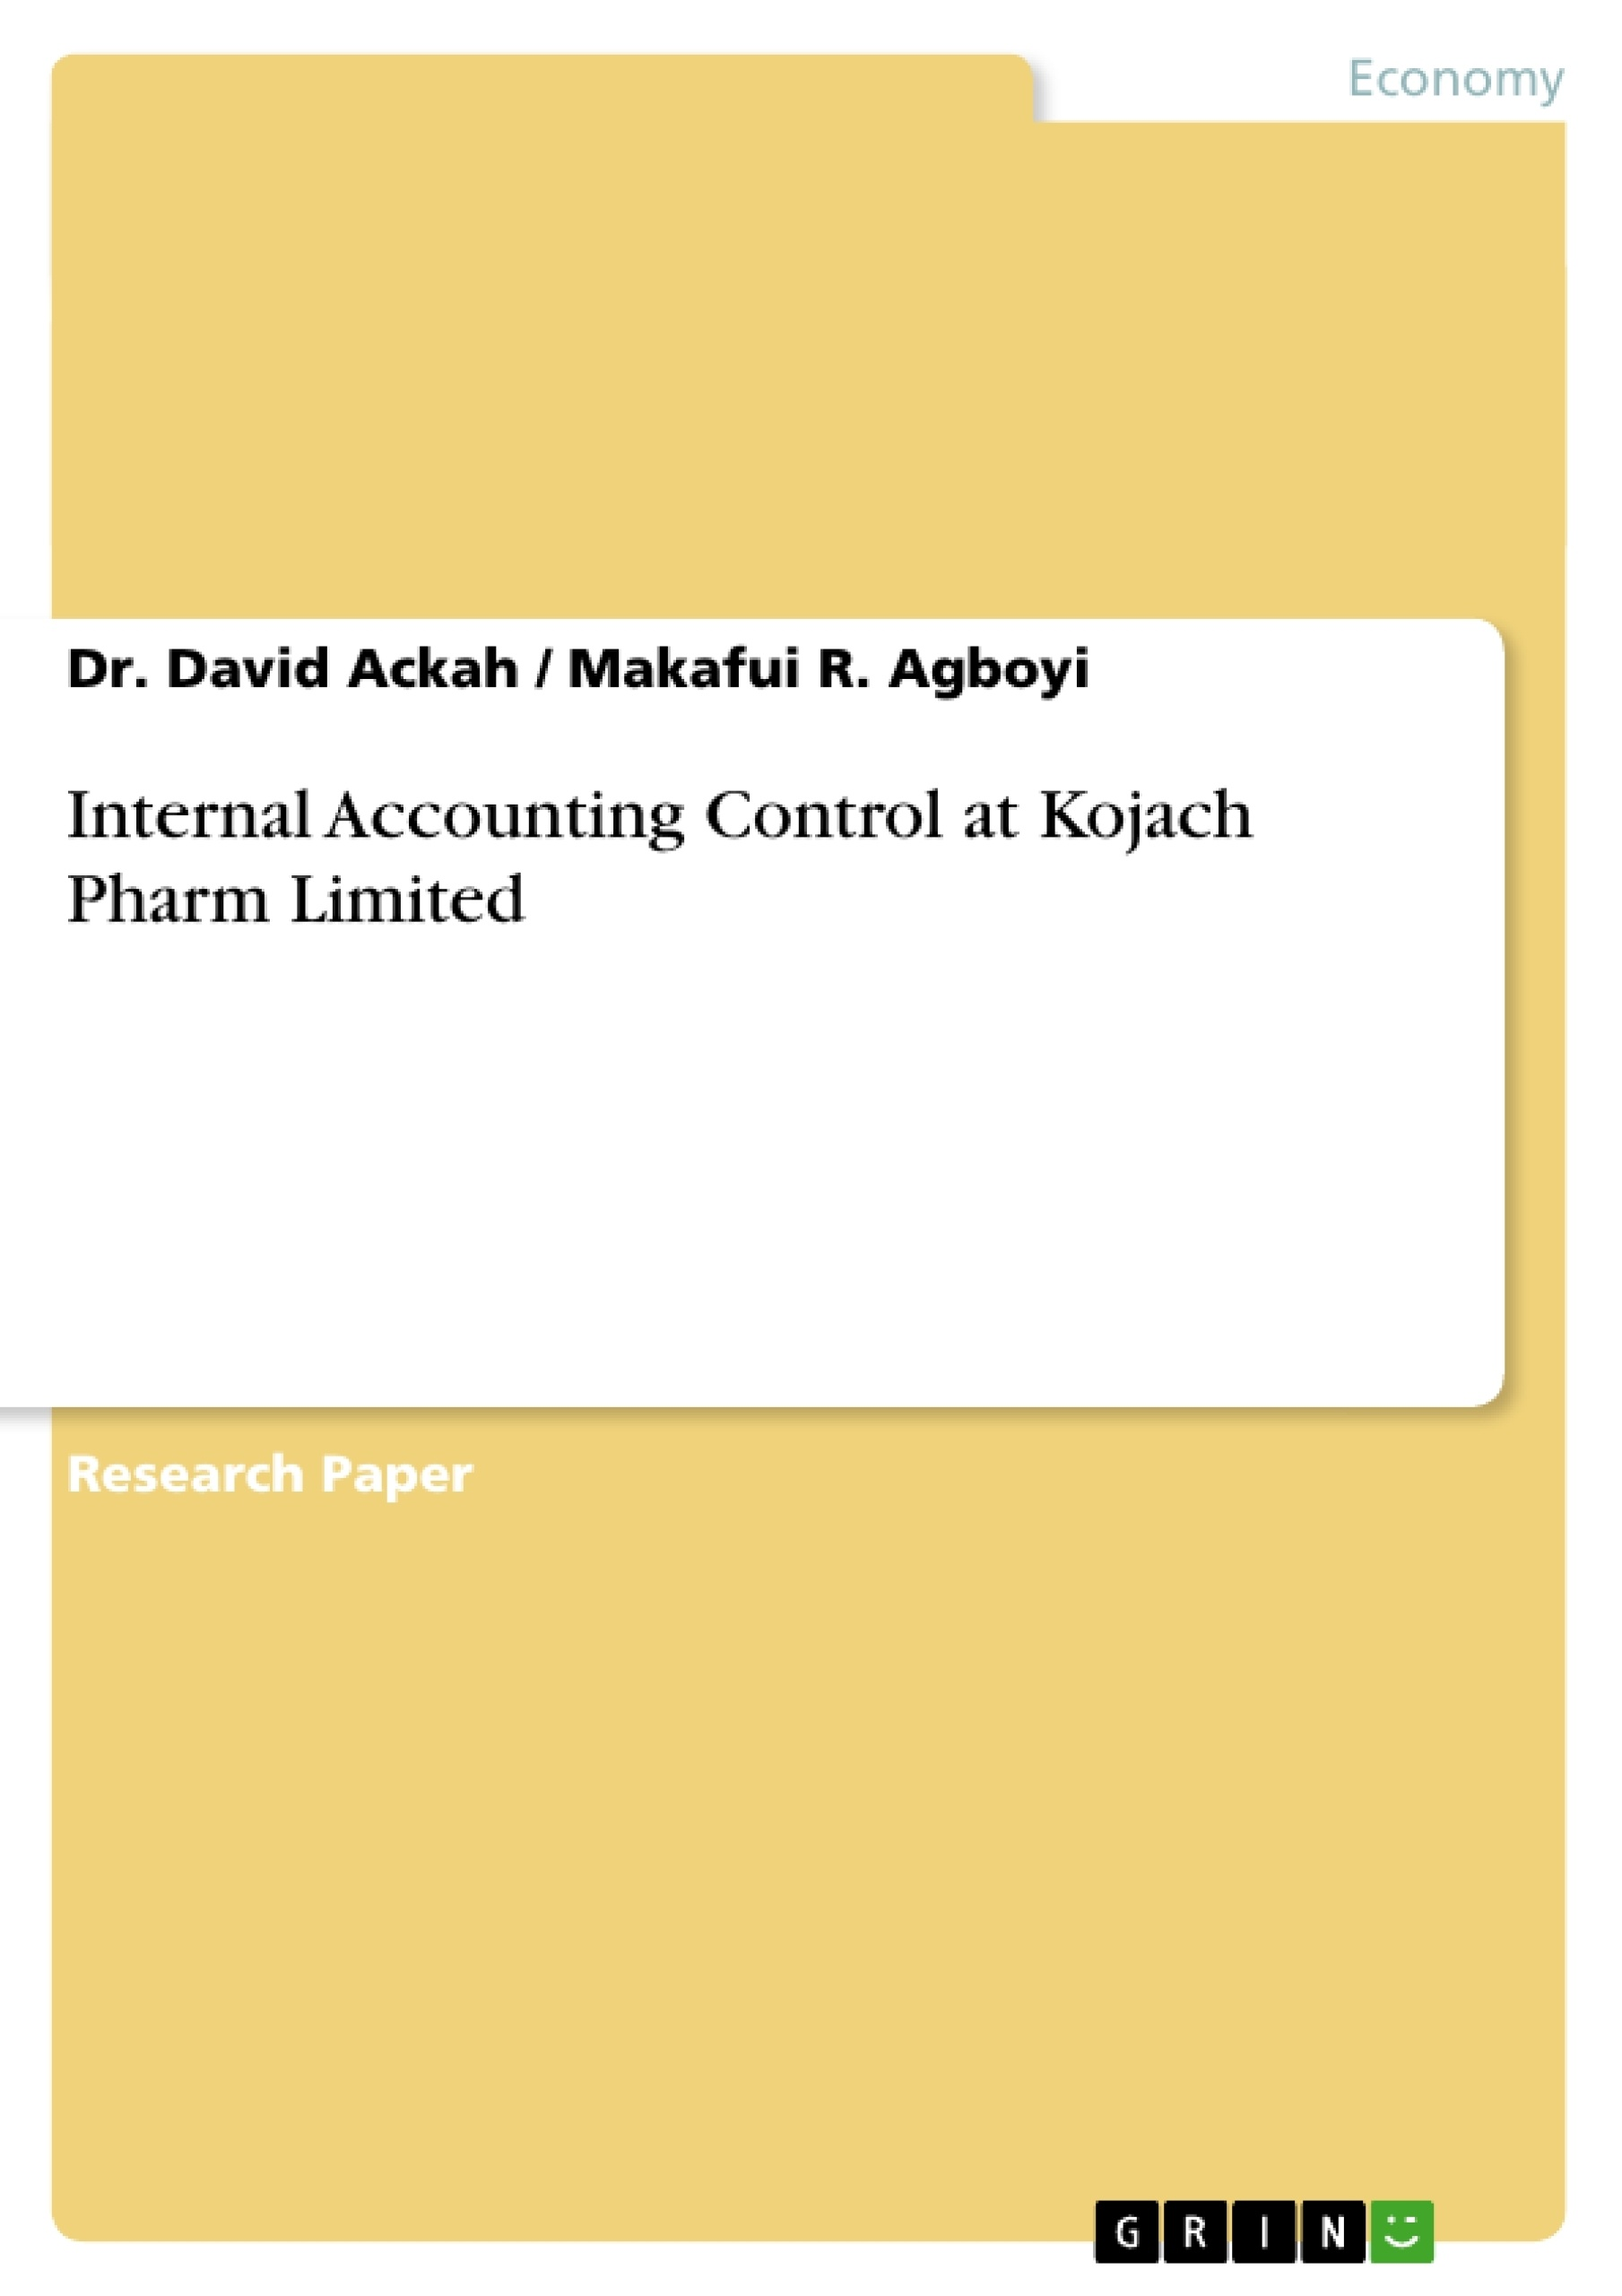 Internal control thesis